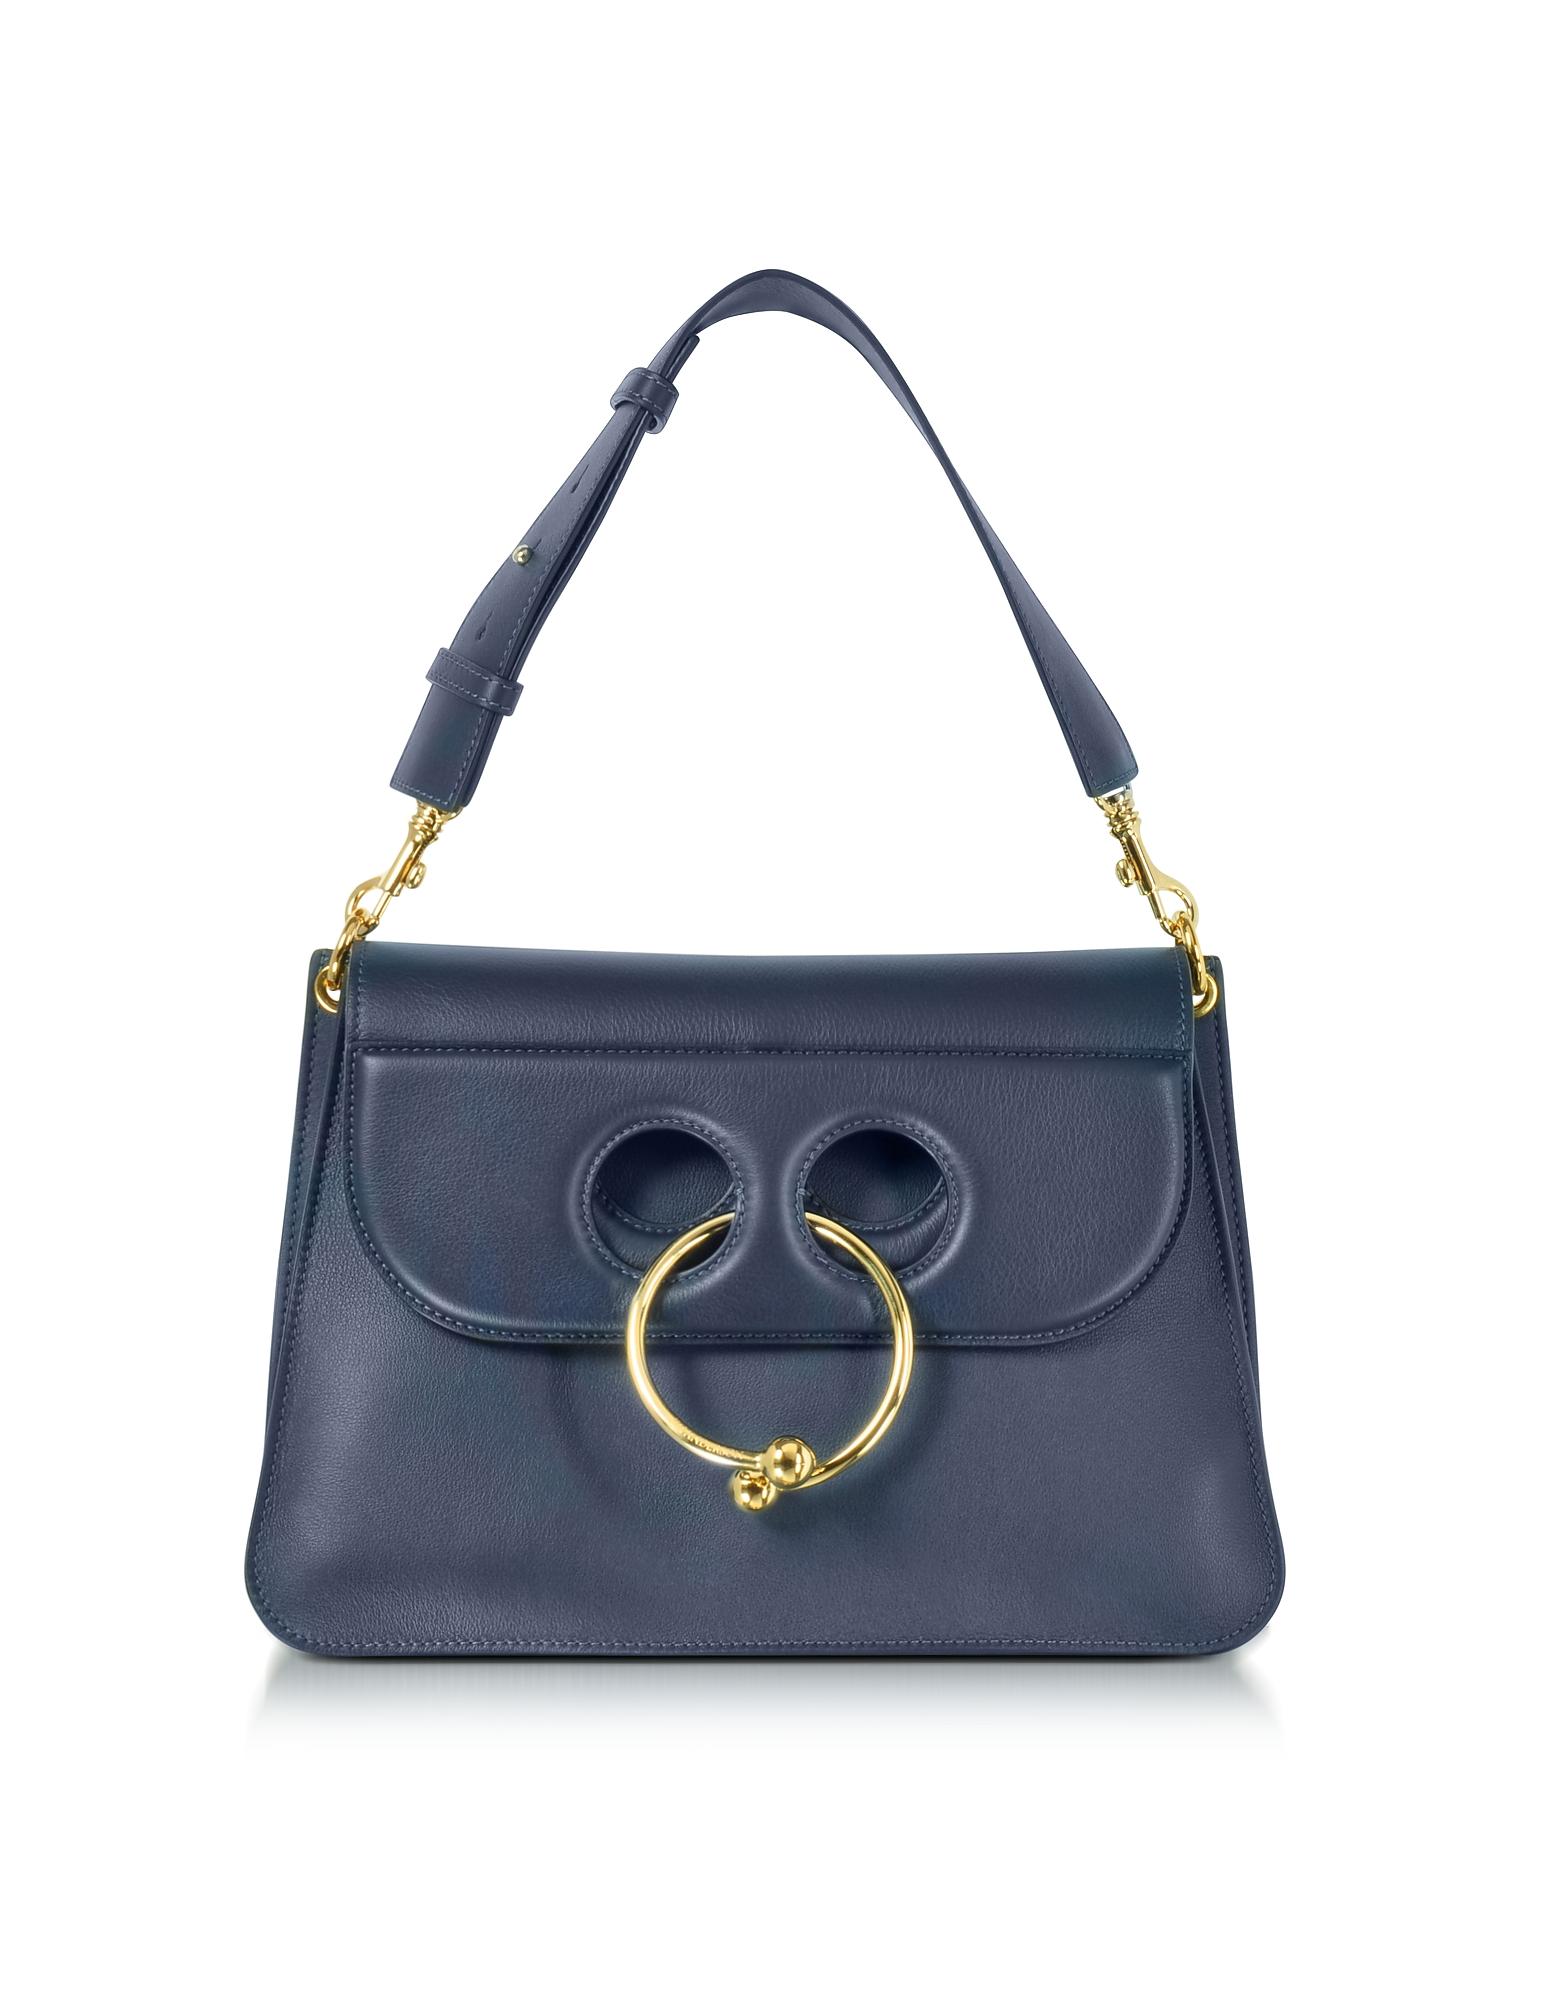 J.W. Anderson Handbags, Navy Leather Medium Pierce Bag